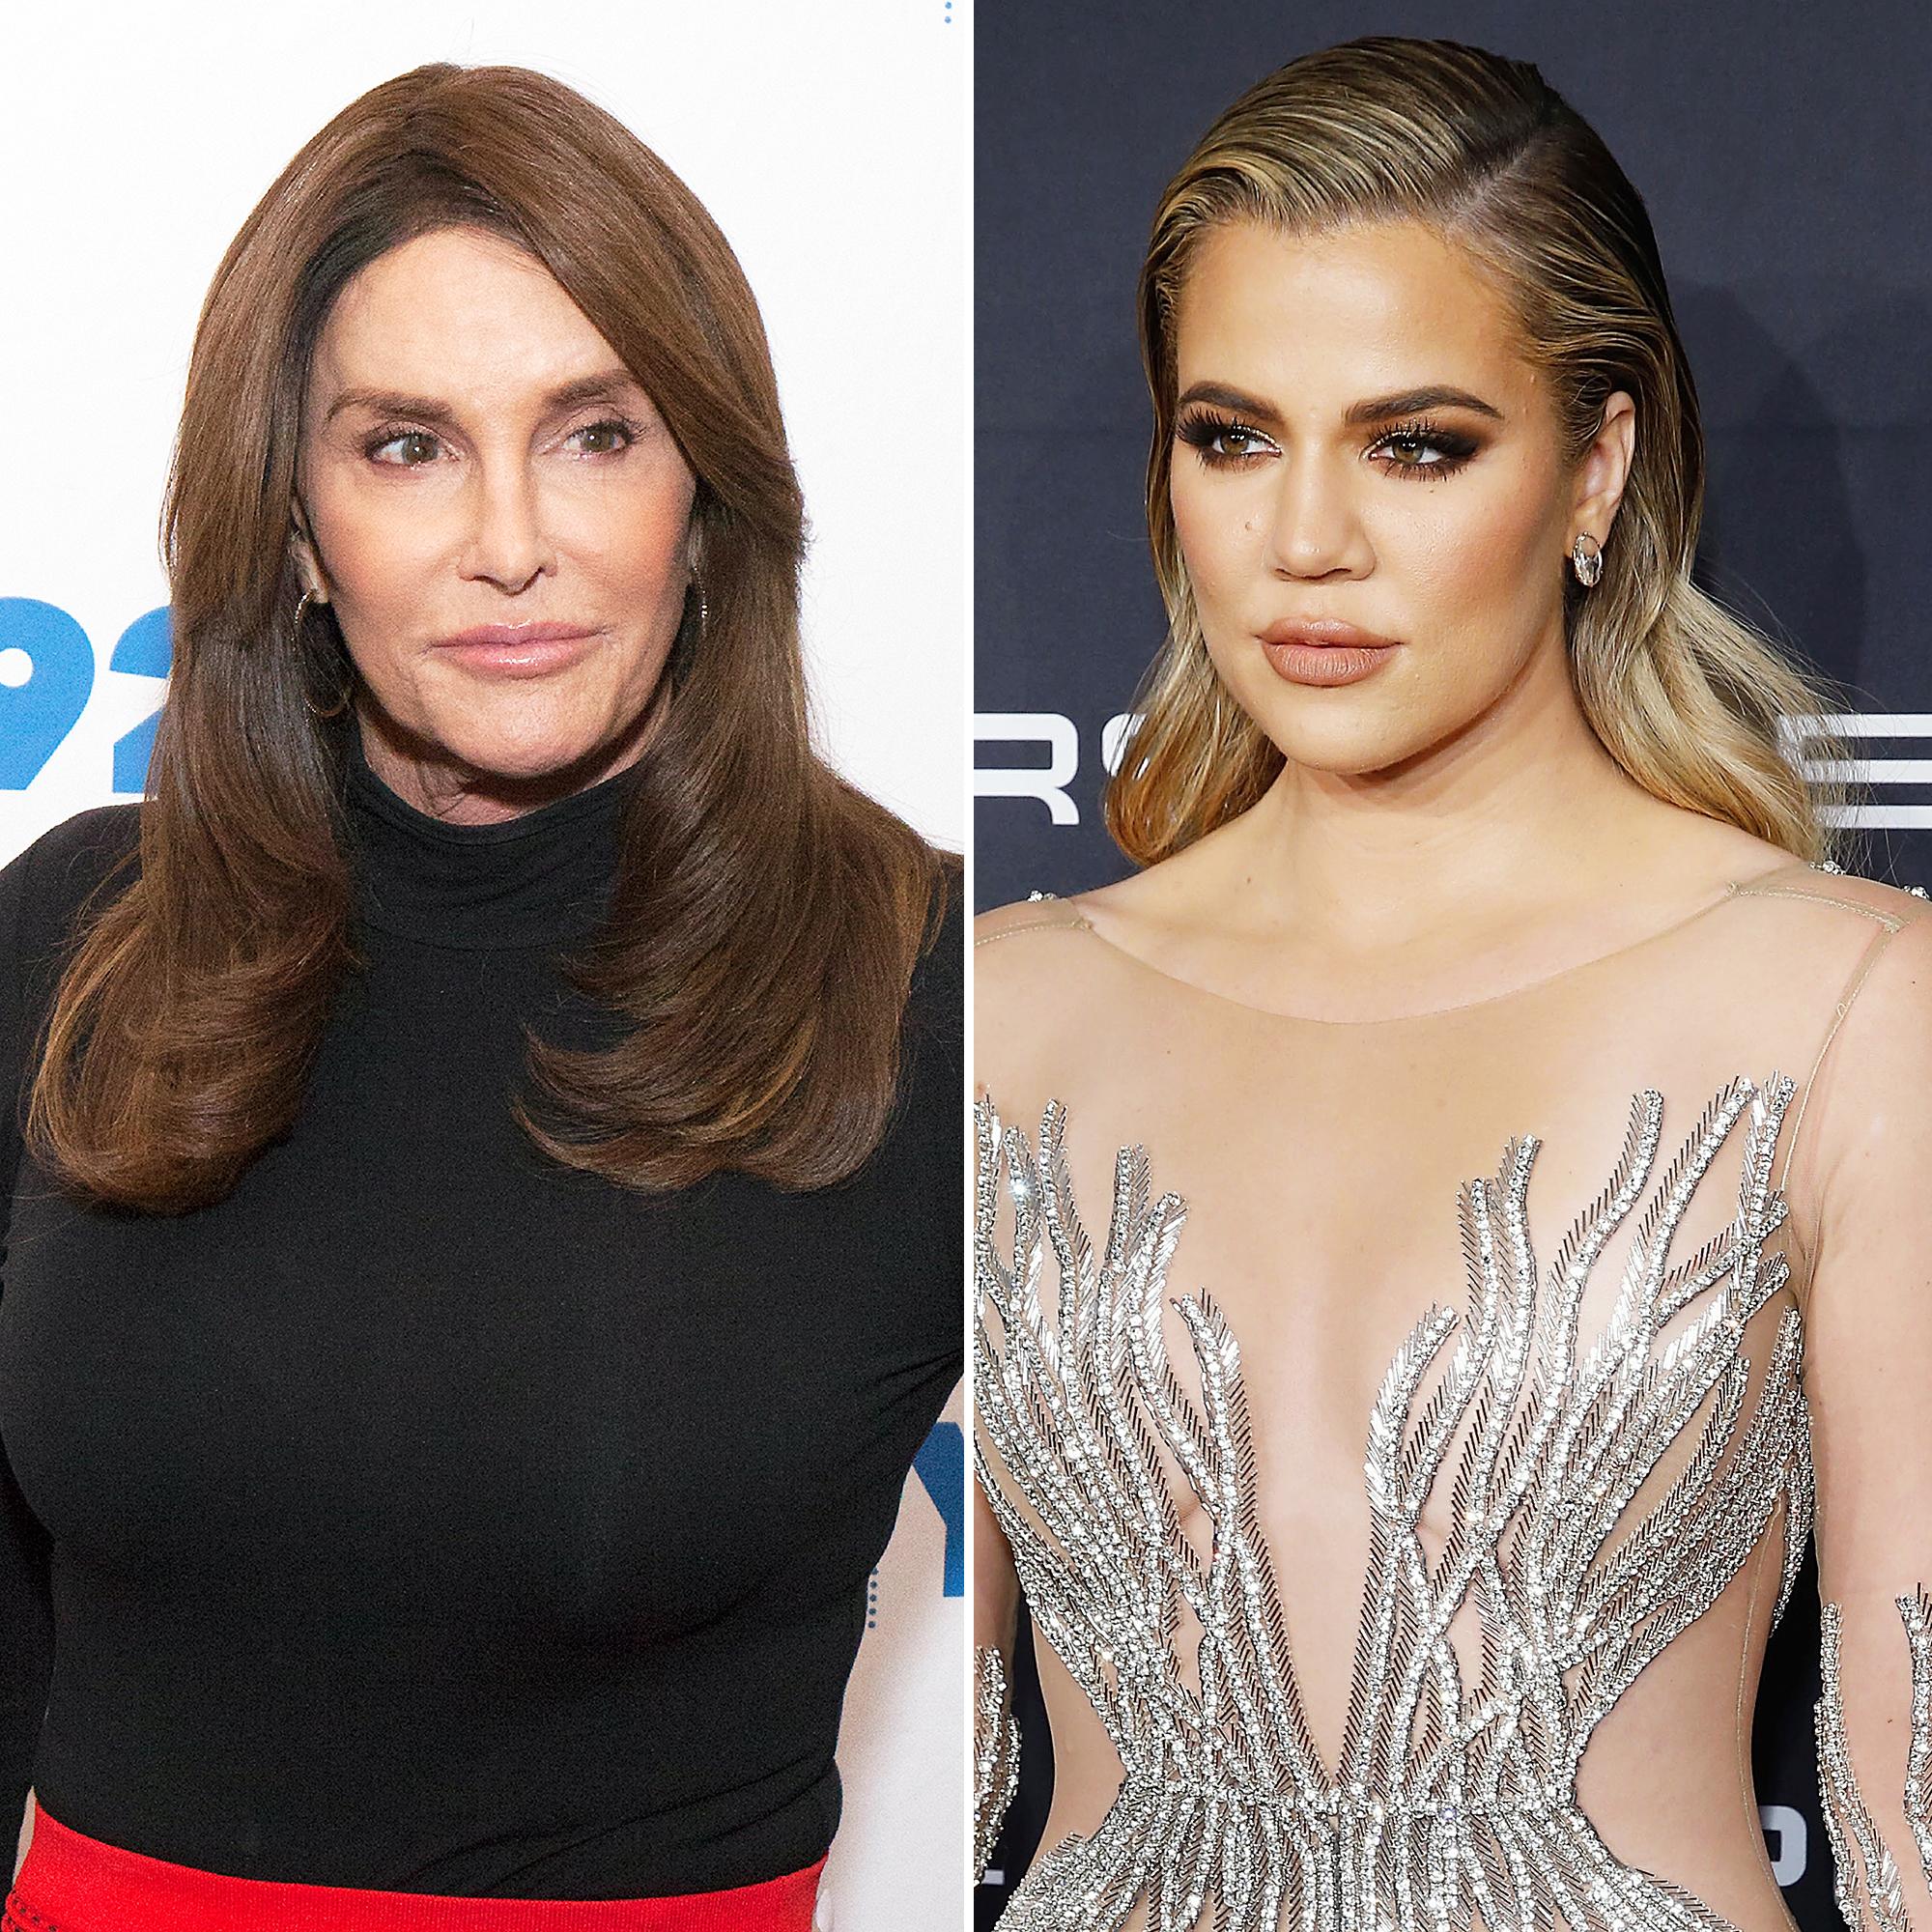 Caitlyn and Kris Jenner Unintentionally Match in Identical White BandageDresses